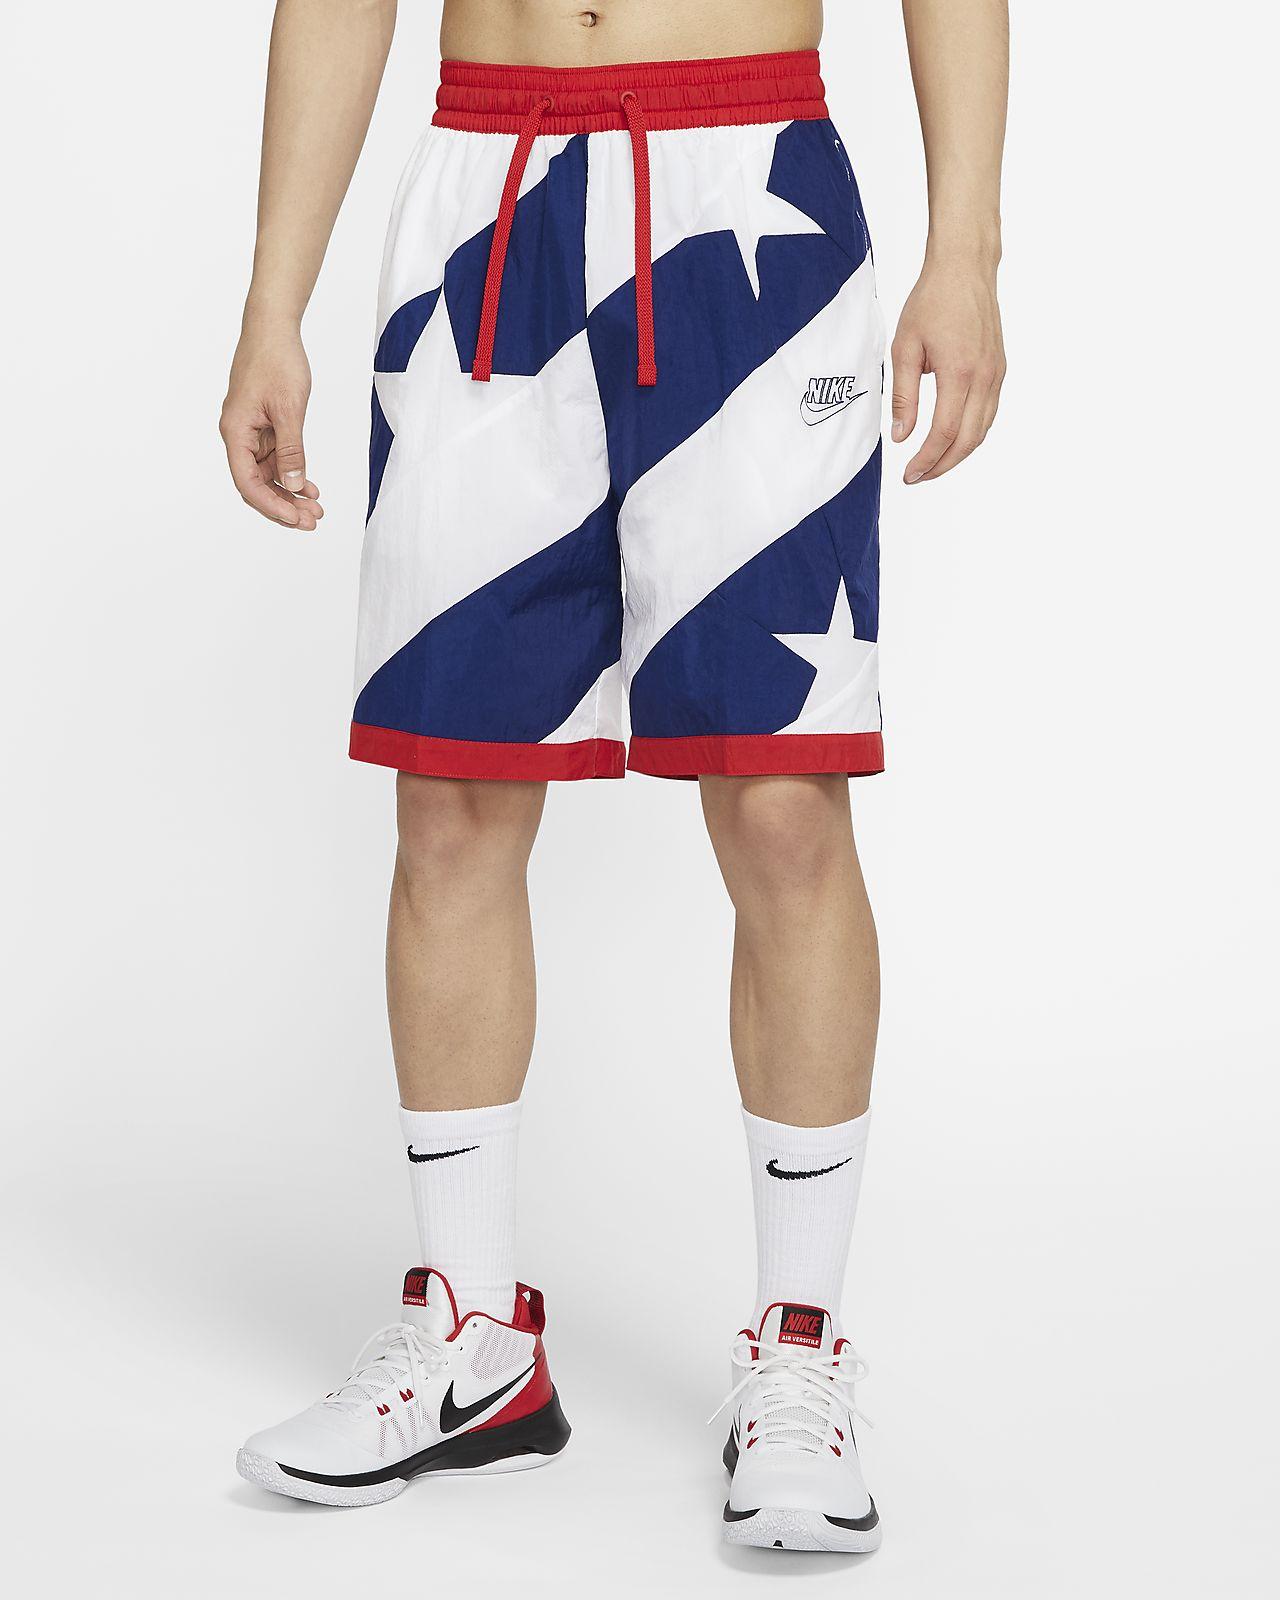 Мужские баскетбольные шорты Nike Dri-FIT Throwback